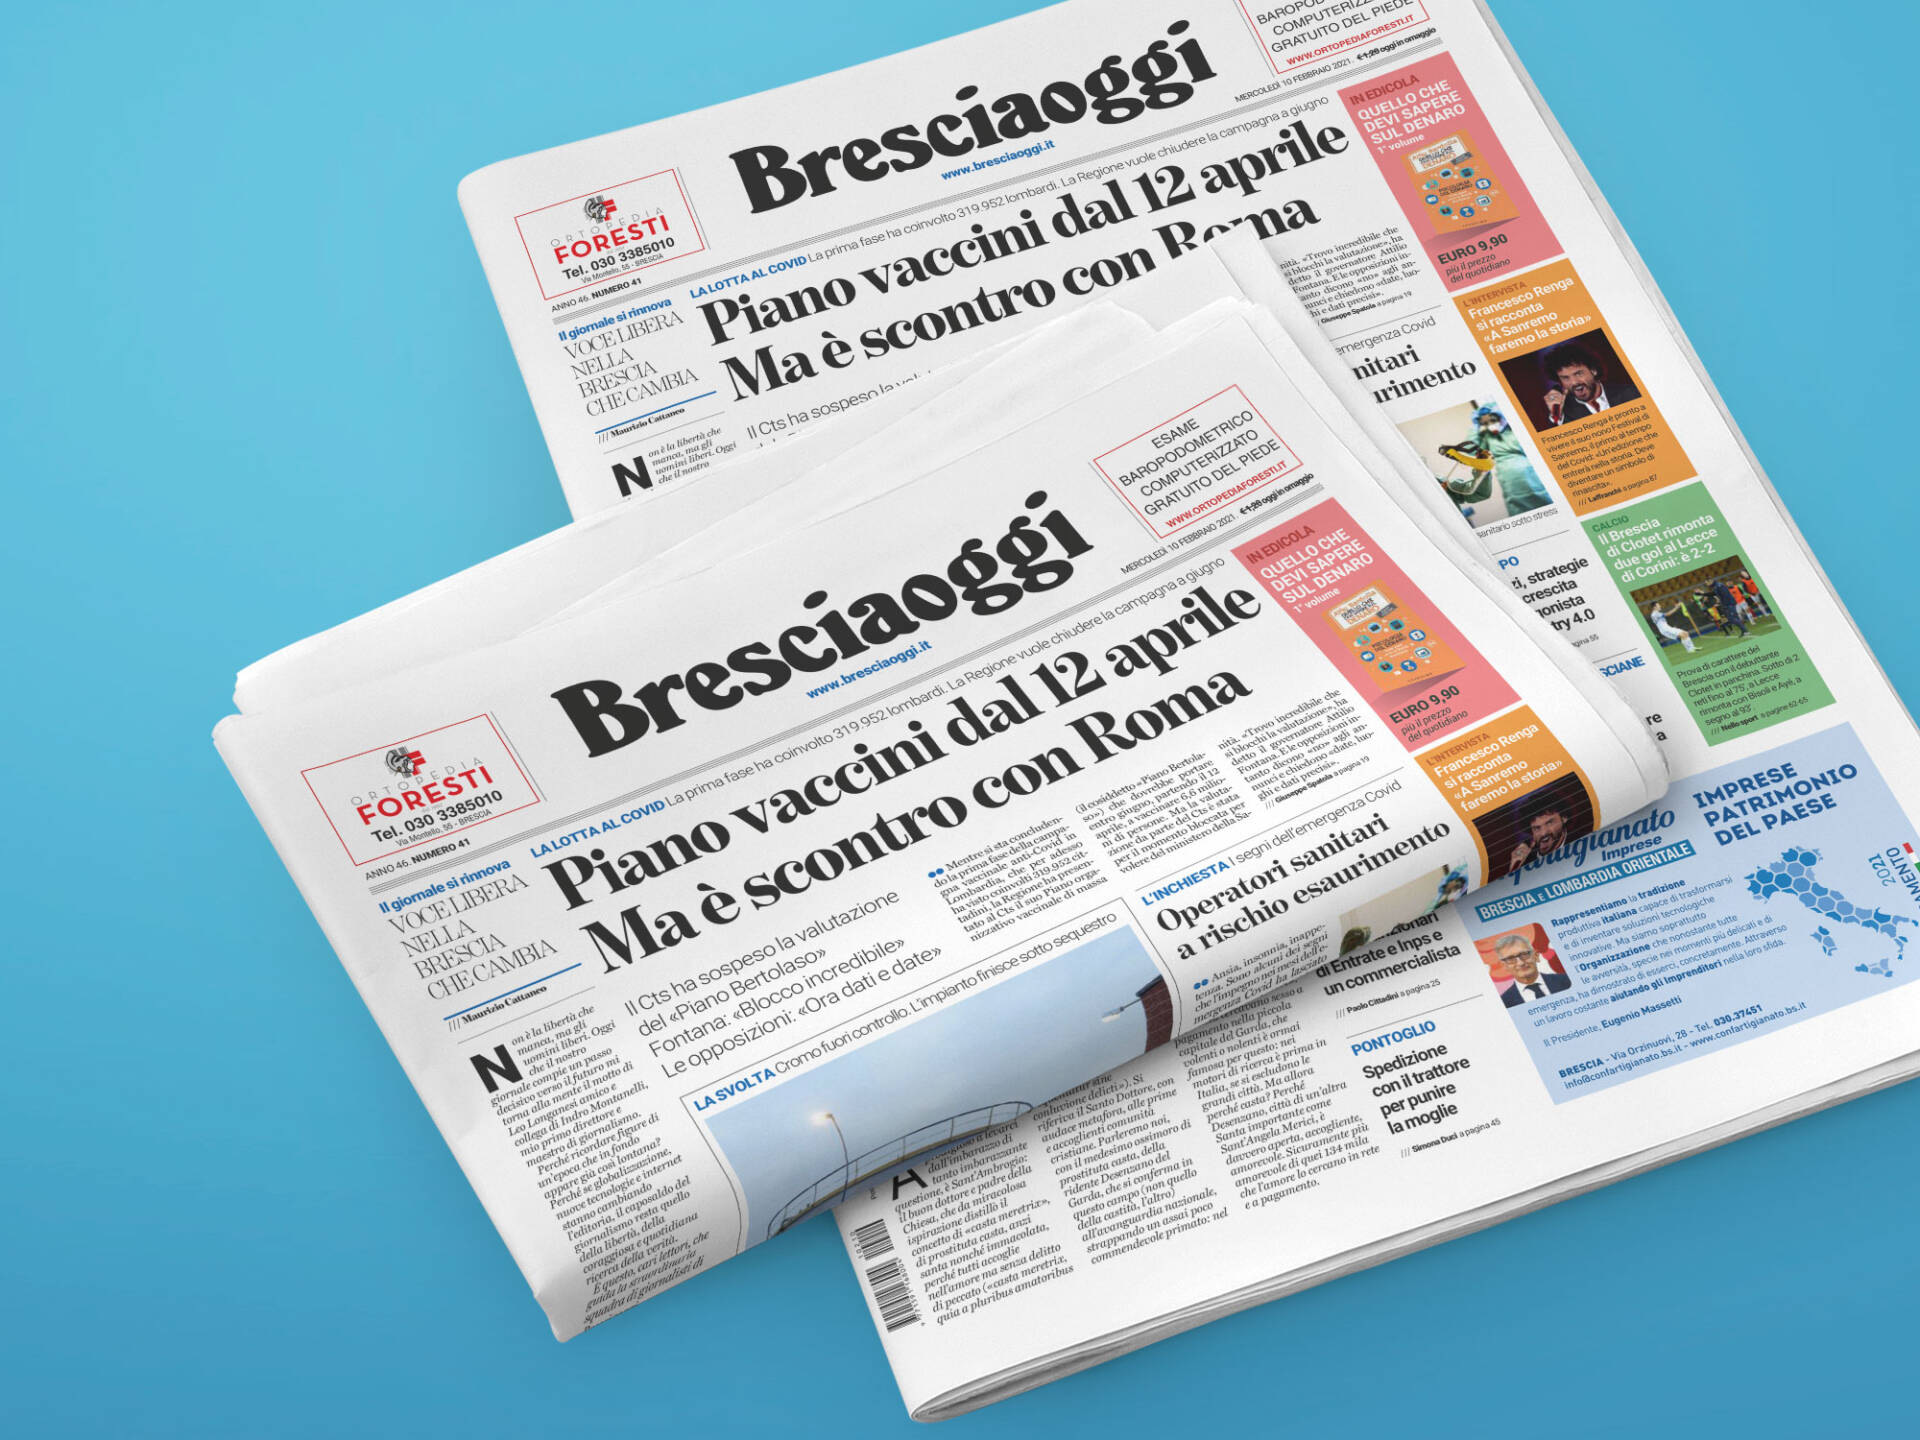 BresciaOggi_012021_Wenceslau_News_Design